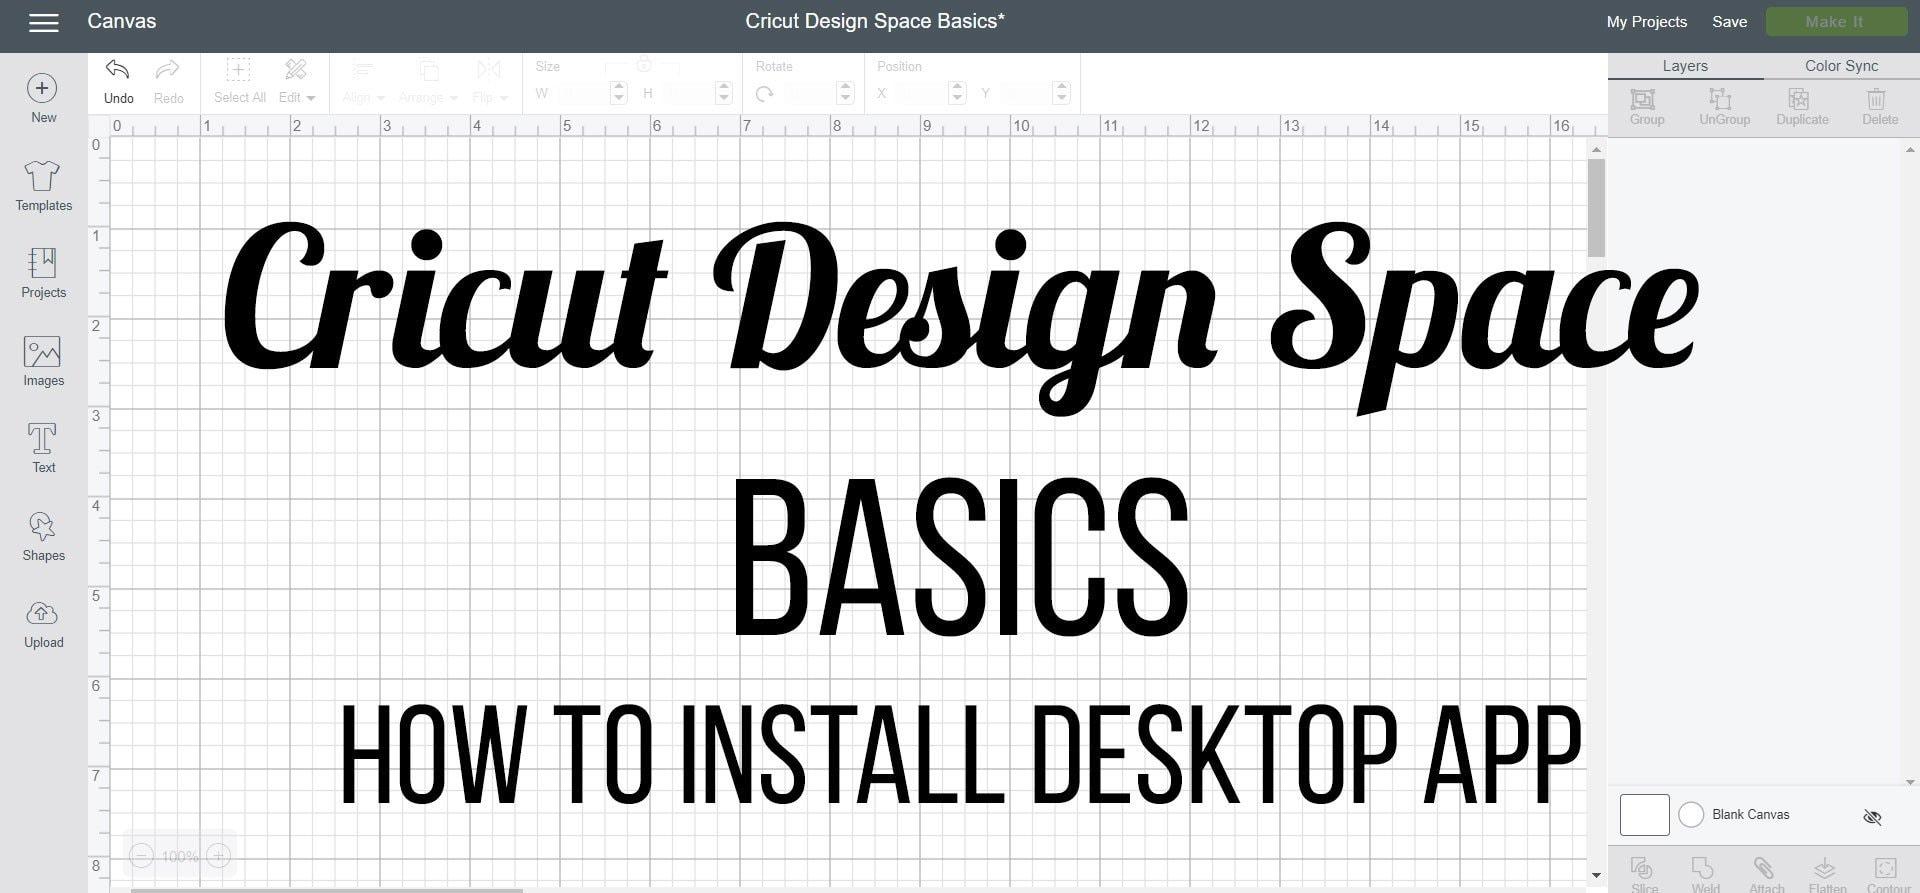 Cricut Design Space Basics - How to Install Desktop App